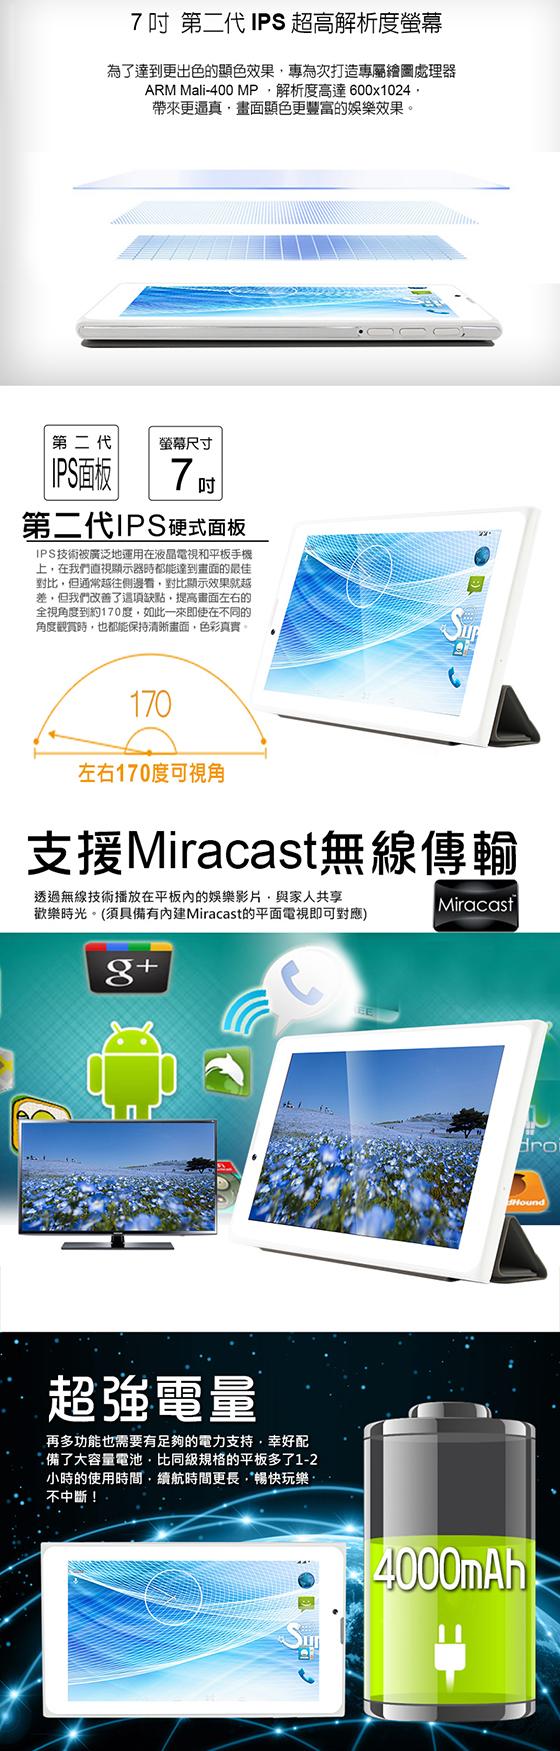 A1-769X八核架構3G通話平板-800_03.jpg